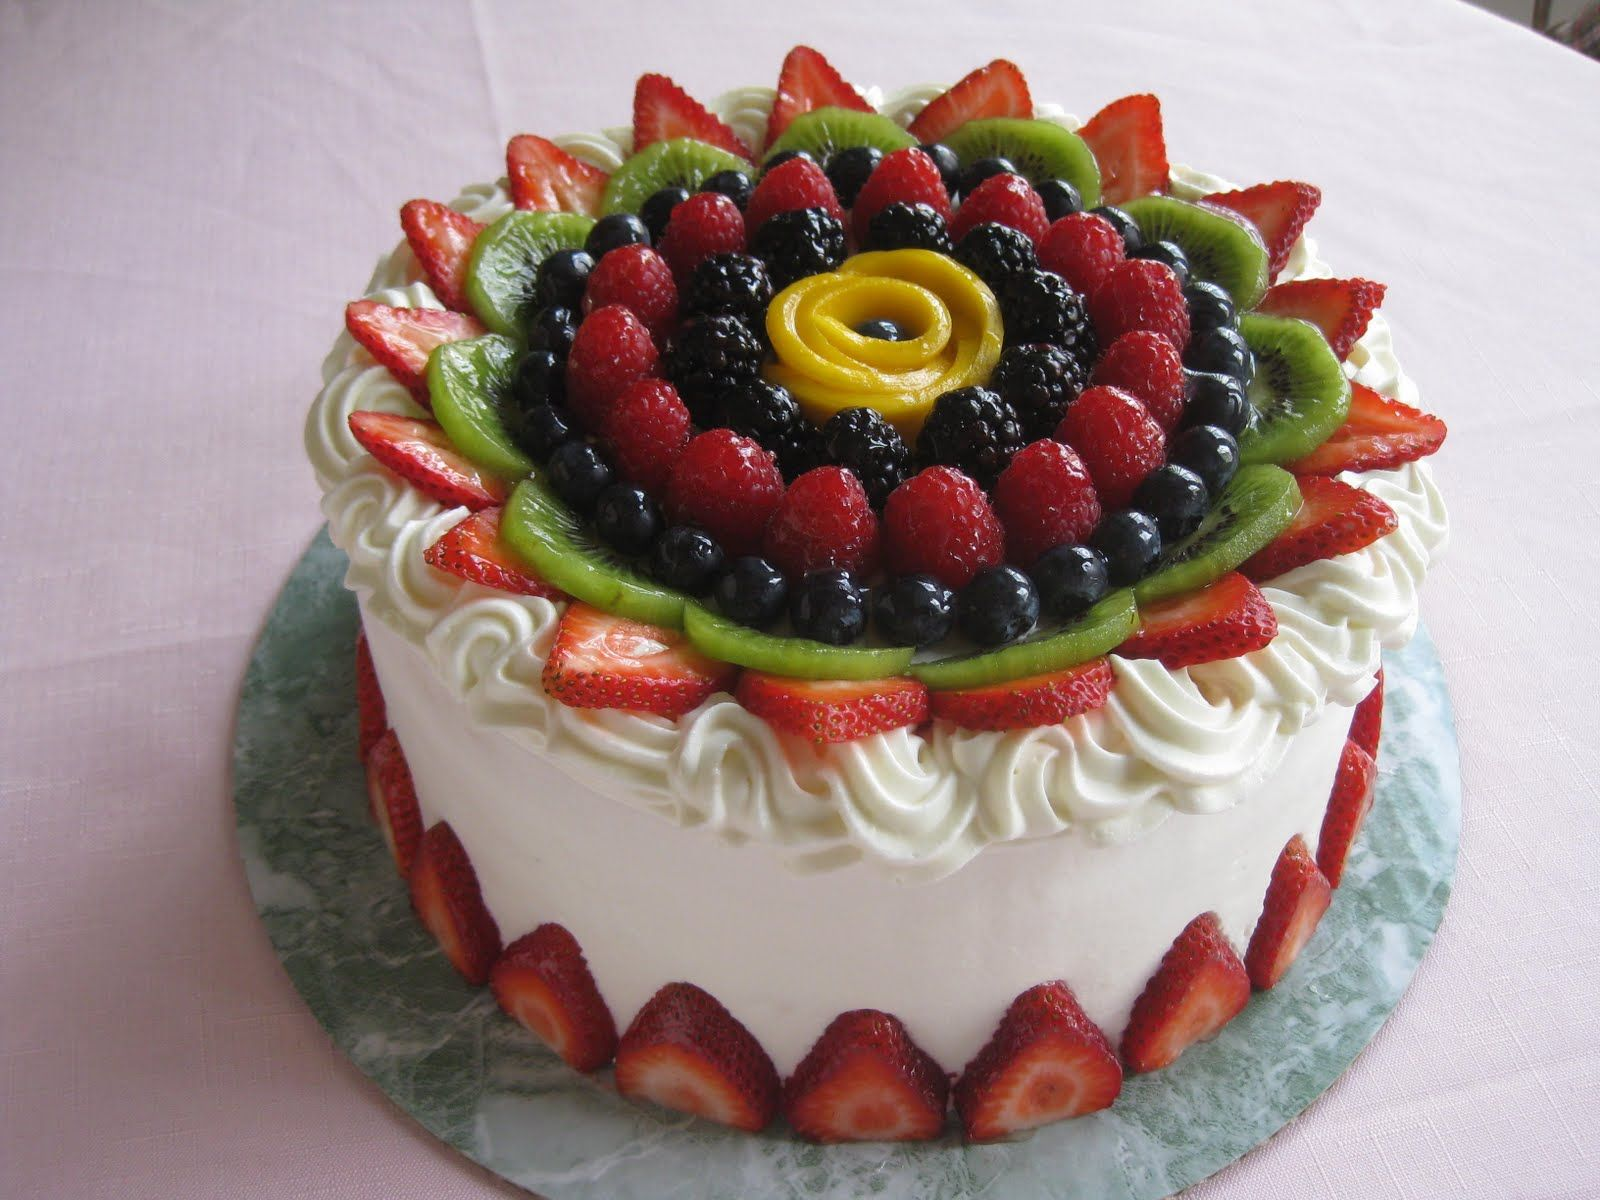 Fresh Fruit Cake Decorations | www.pixshark.com - Images ...